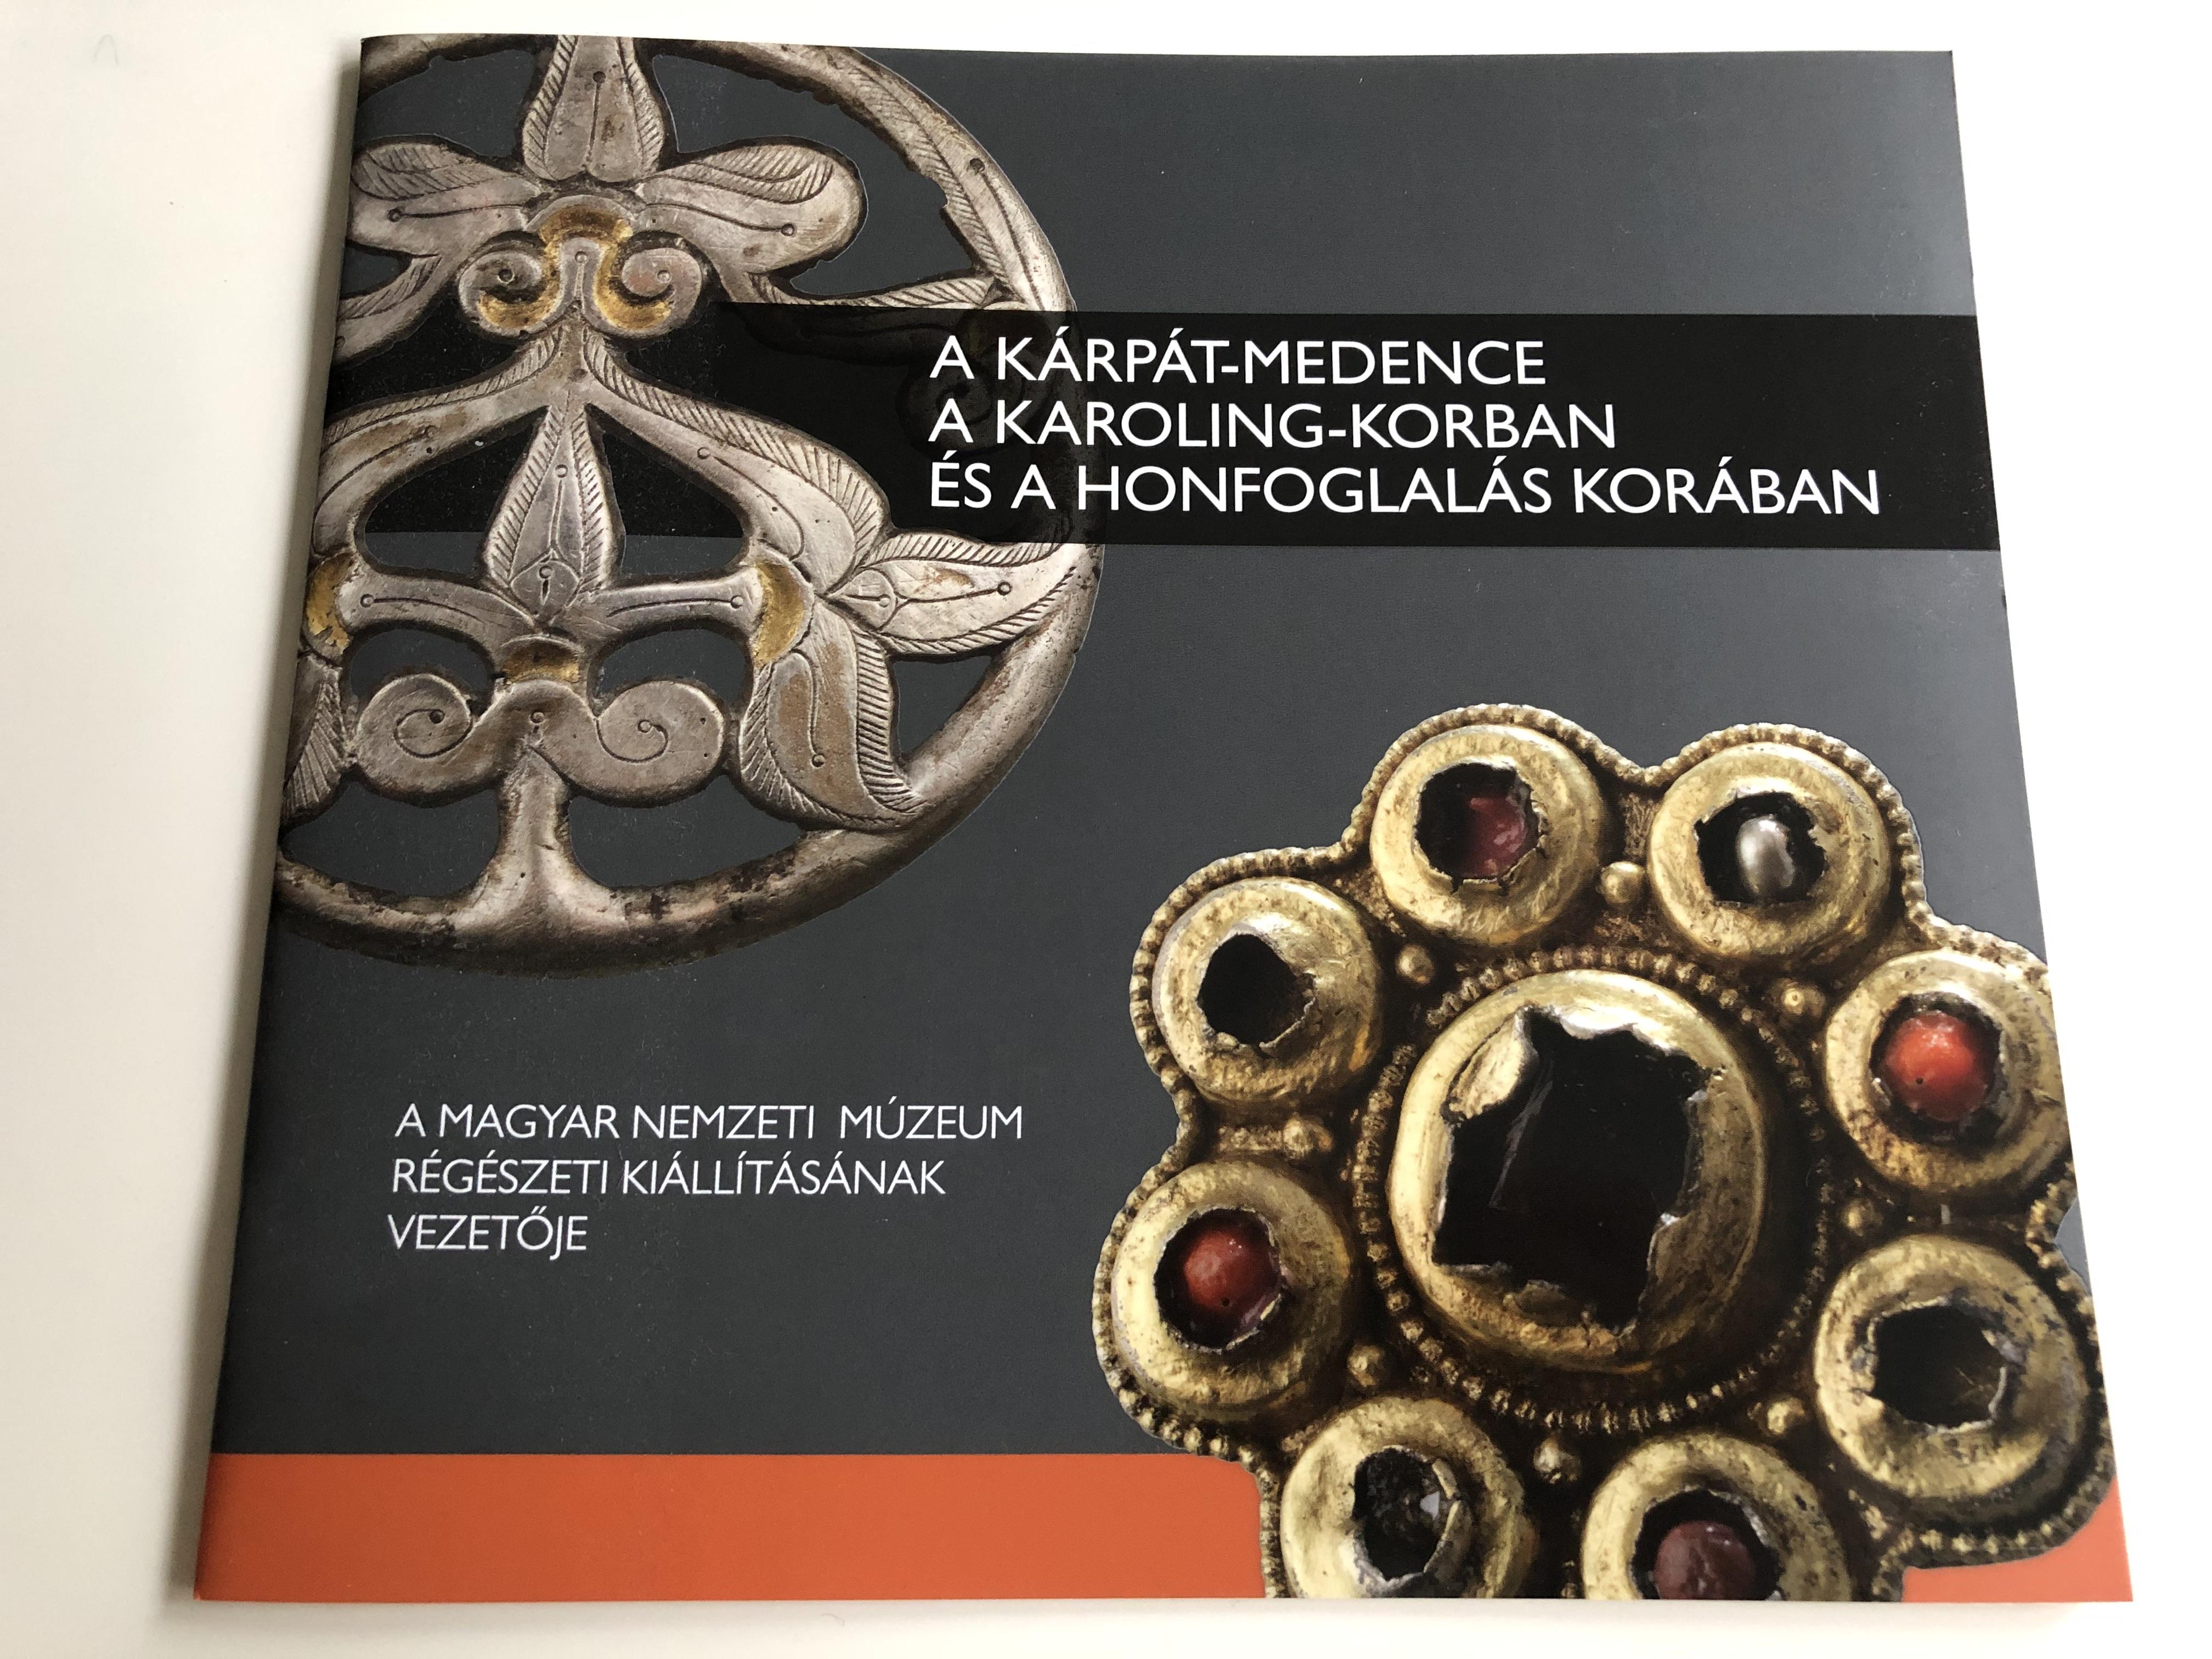 a-k-rp-t-medence-a-karoling-korban-s-a-honfoglal-s-kor-ban-a-magyar-nemzeti-m-zeum-r-g-szeti-ki-ll-t-s-nak-vezet-je-paperback-2014-history-of-the-carpathian-basin-in-the-age-of-karolings-and-the-age-of-hungarian-conques-1-.jpg